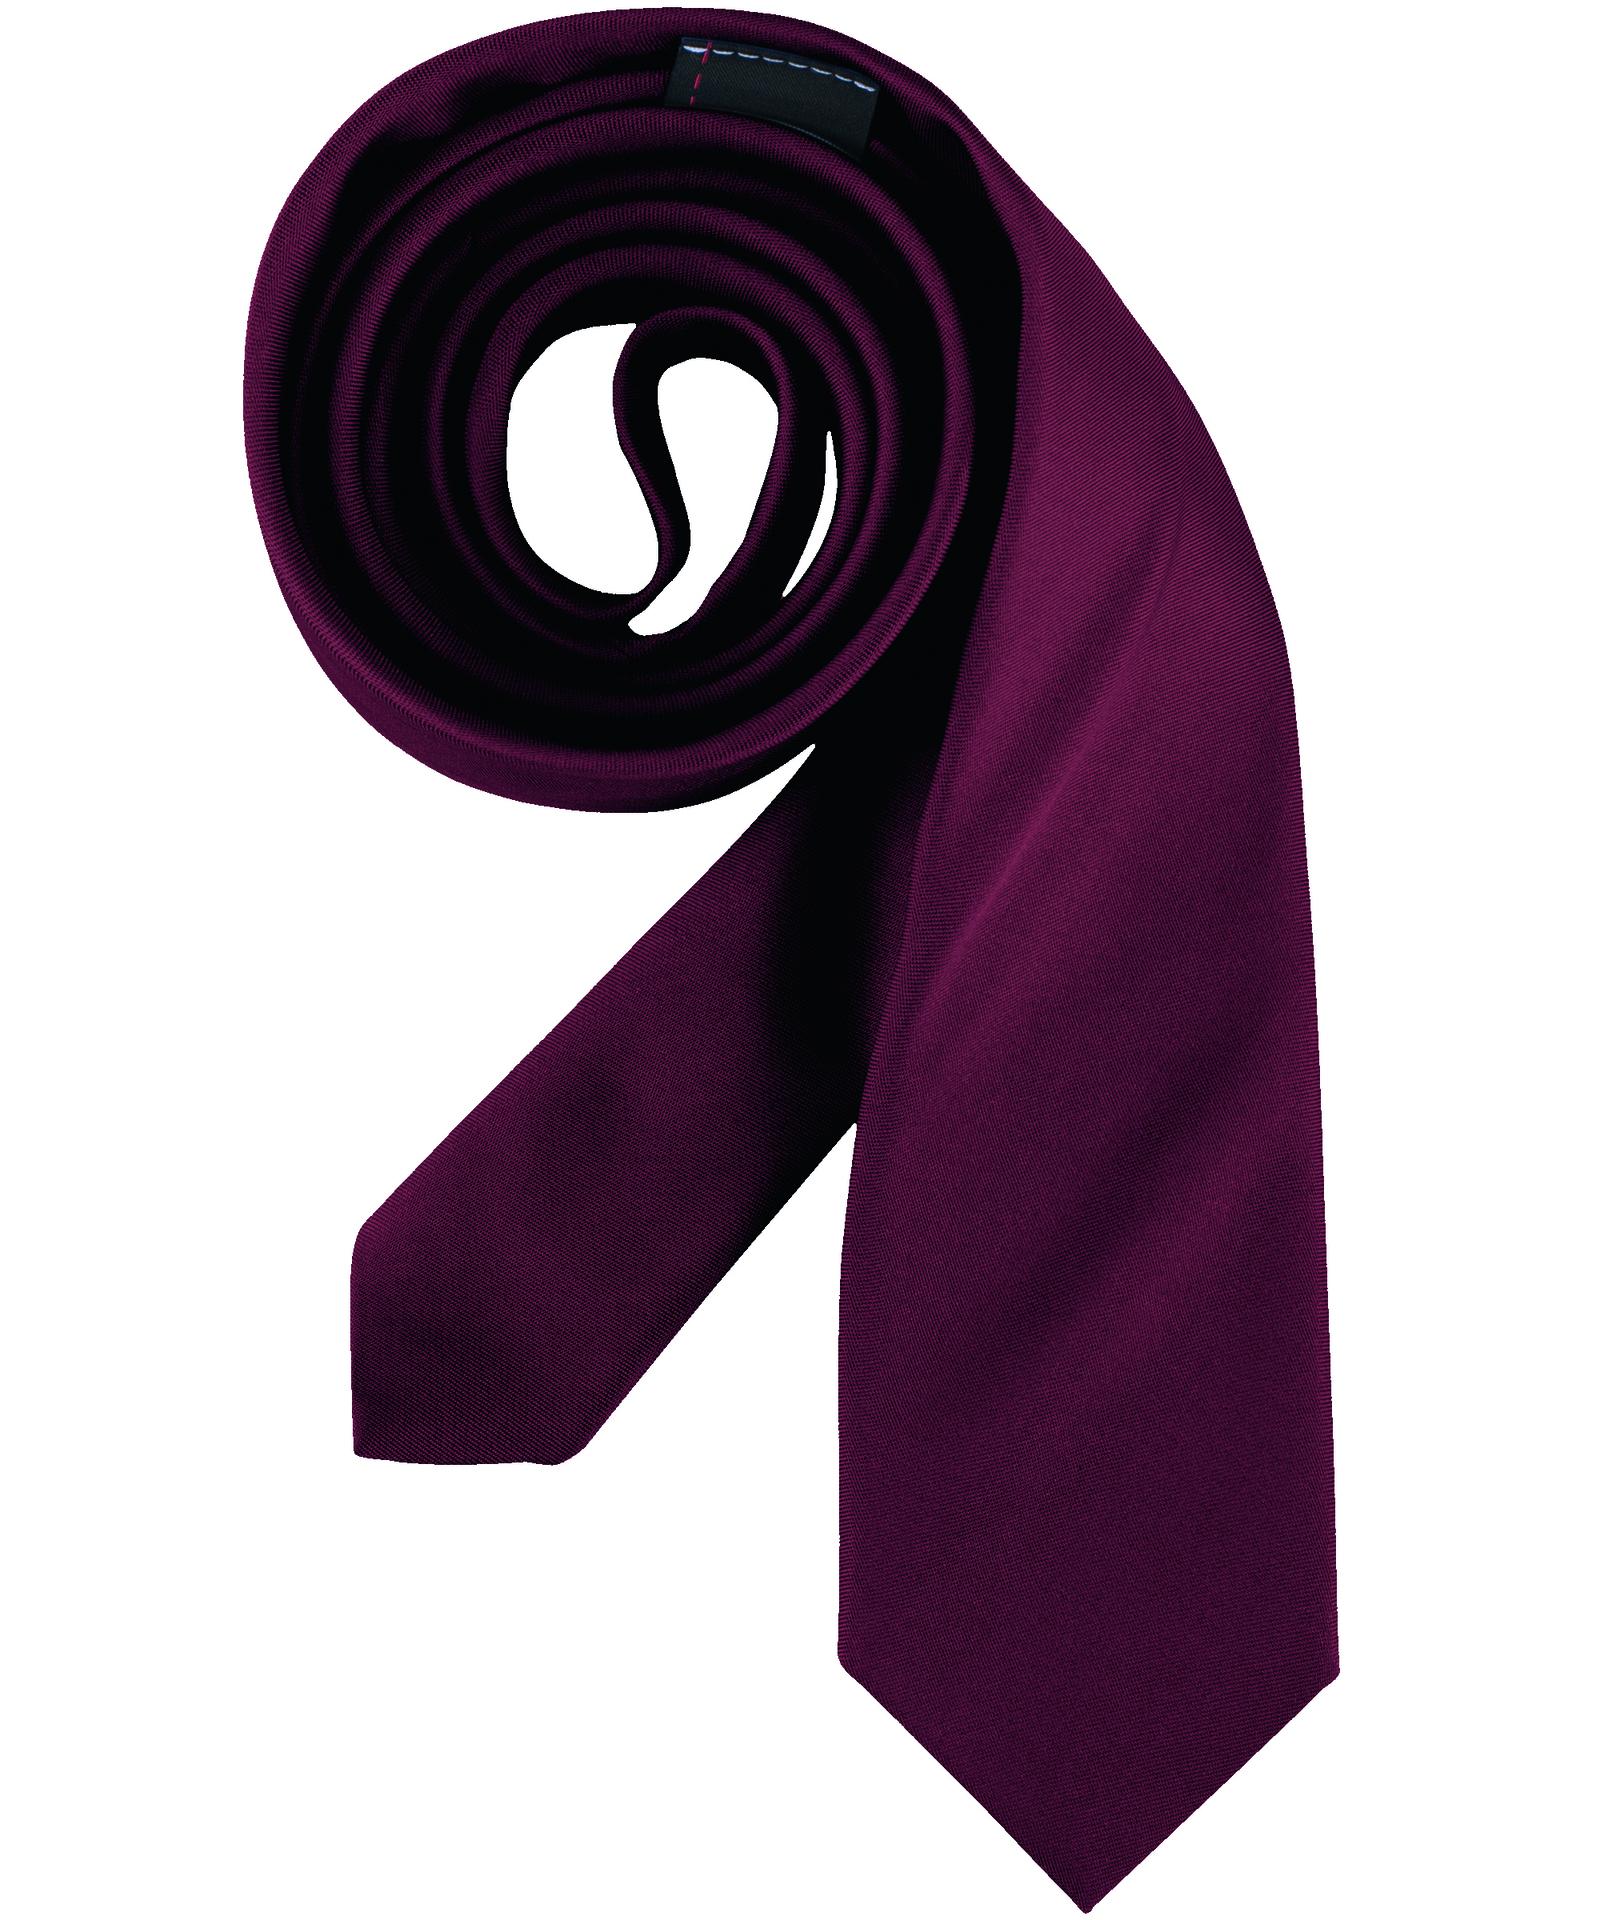 6918 9500 Krawatte Slimline